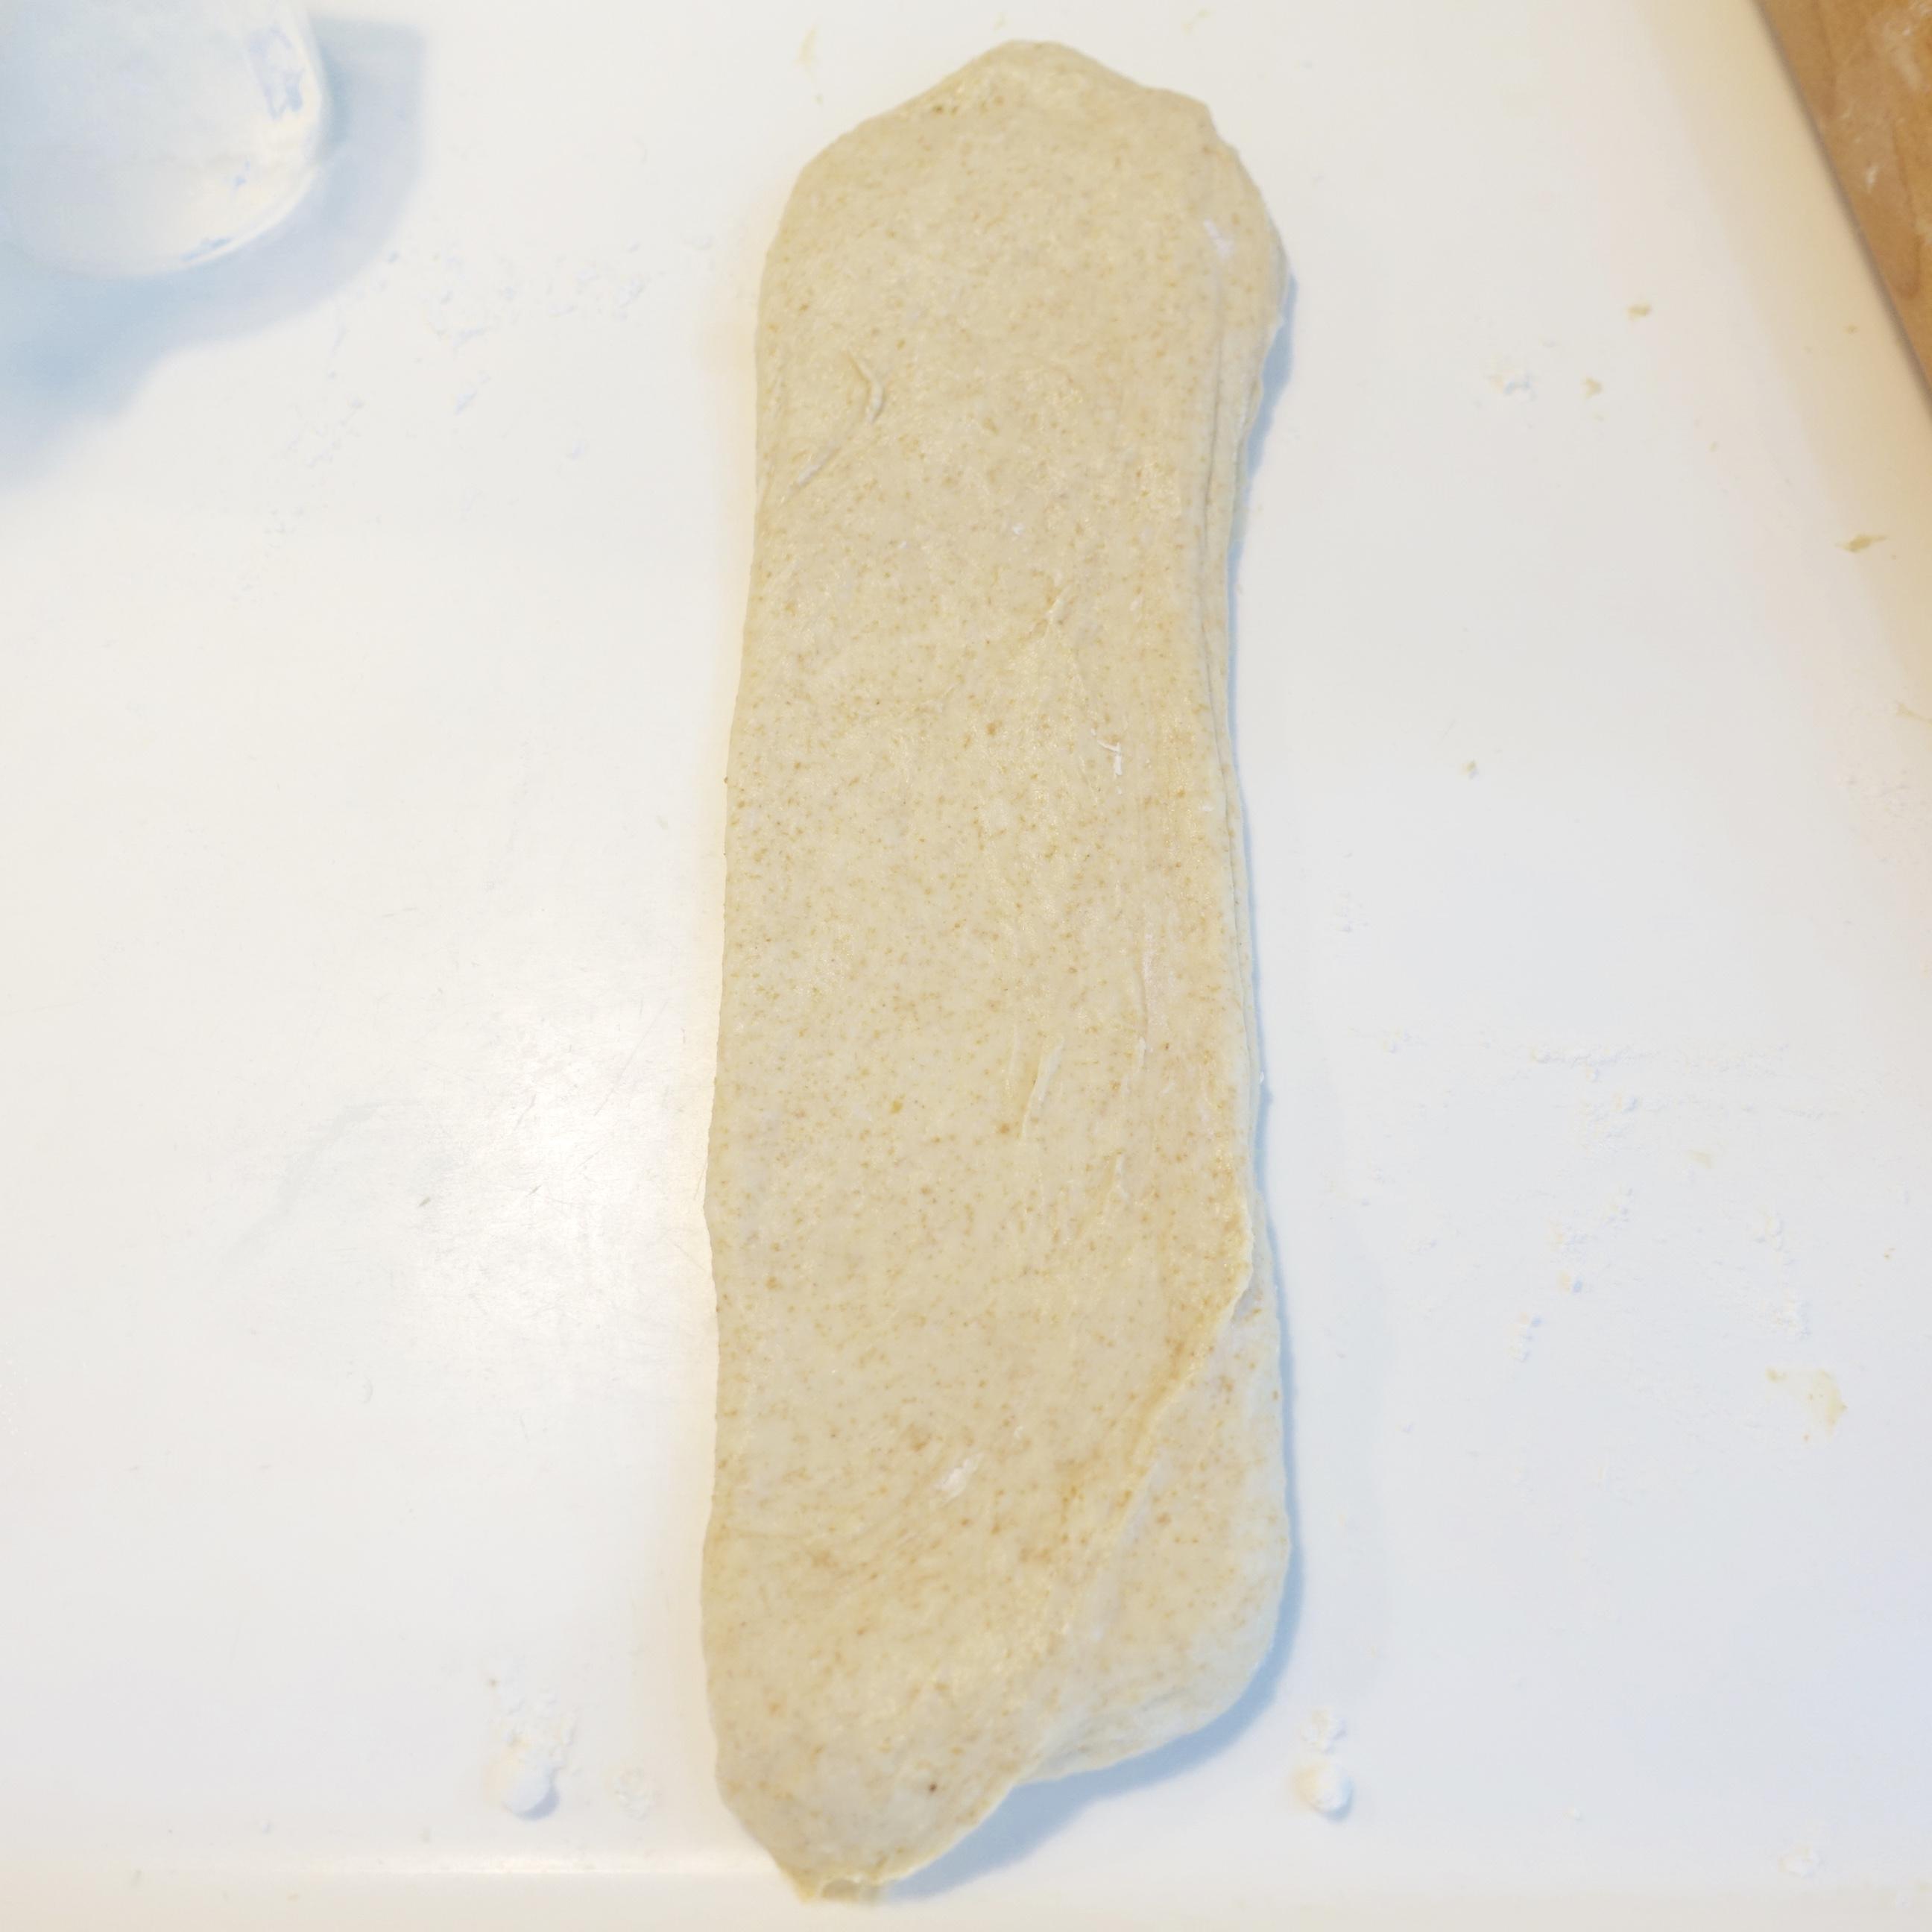 soft sourdough wholemeal bread flatten